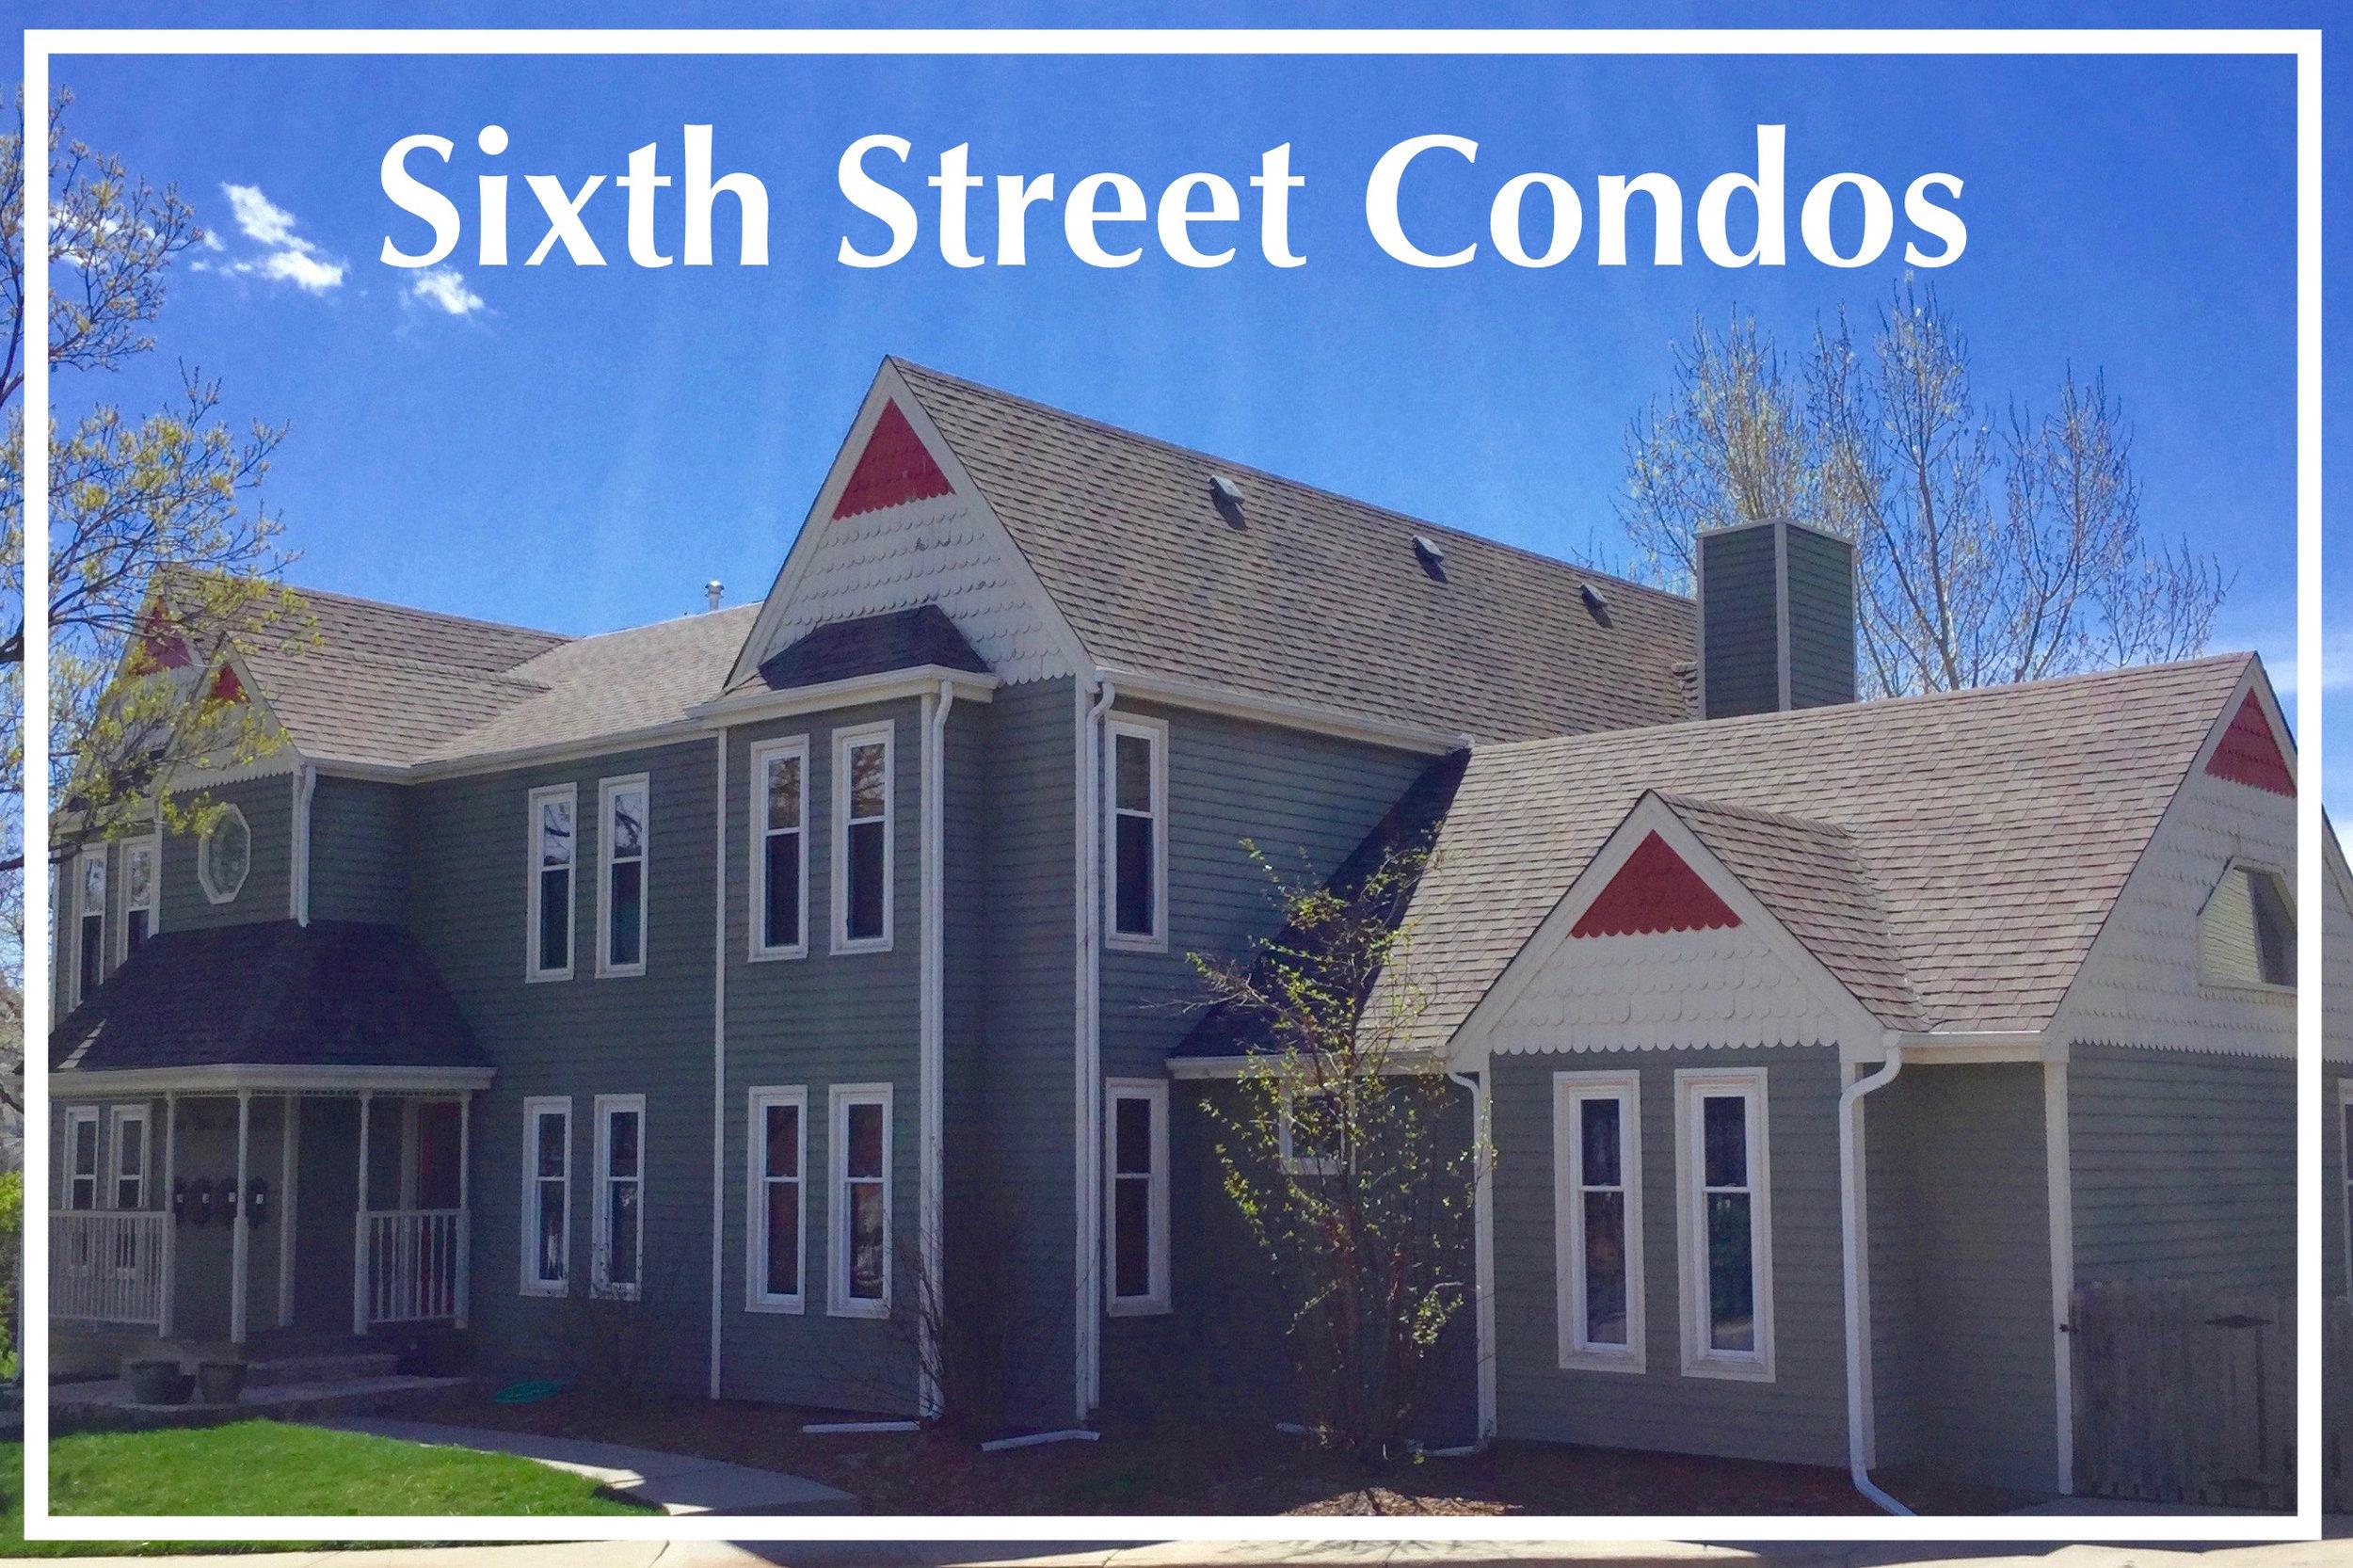 Sixth Street Condos.jpg